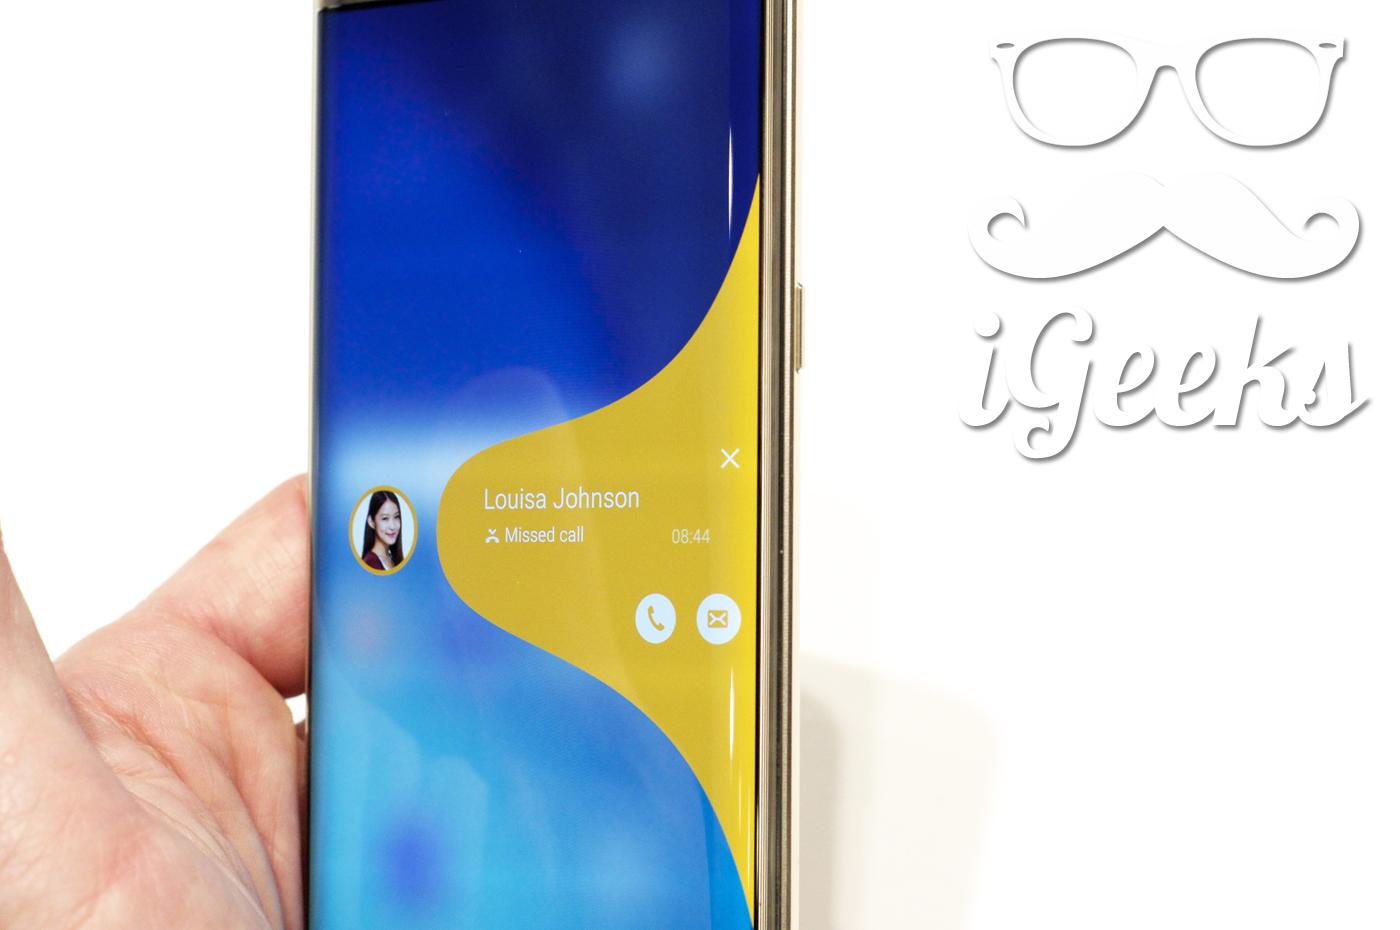 iGeeks-Samsung-S6-MWC2015-26